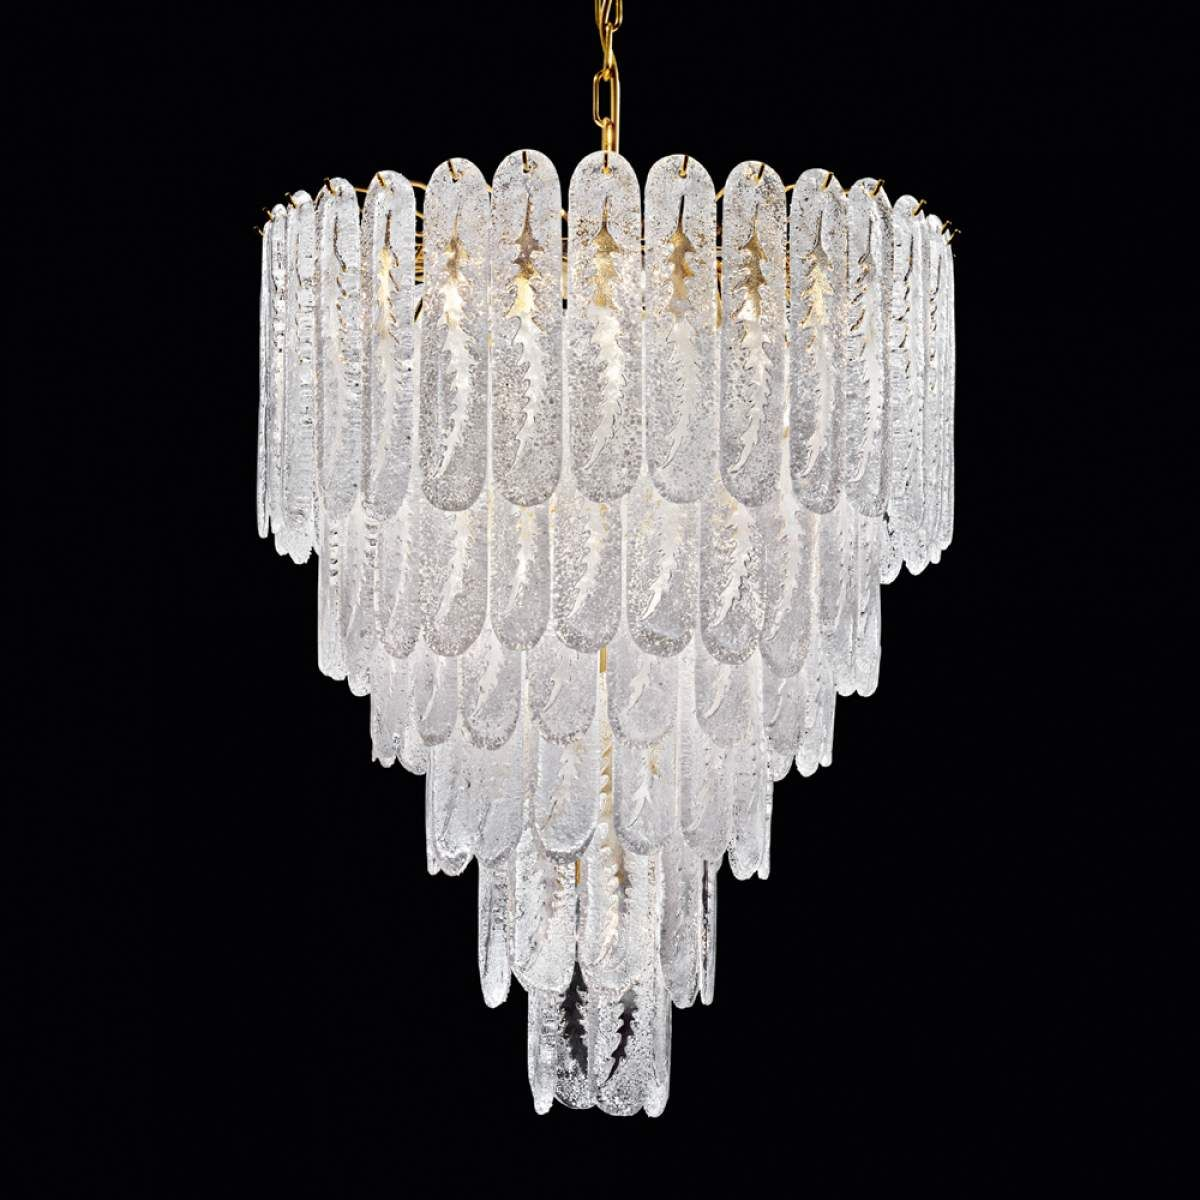 Kronleuchter Pini Aus Murano Glas Von Novaresi Kronleuchter Murano Glas Designer Kronleuchter